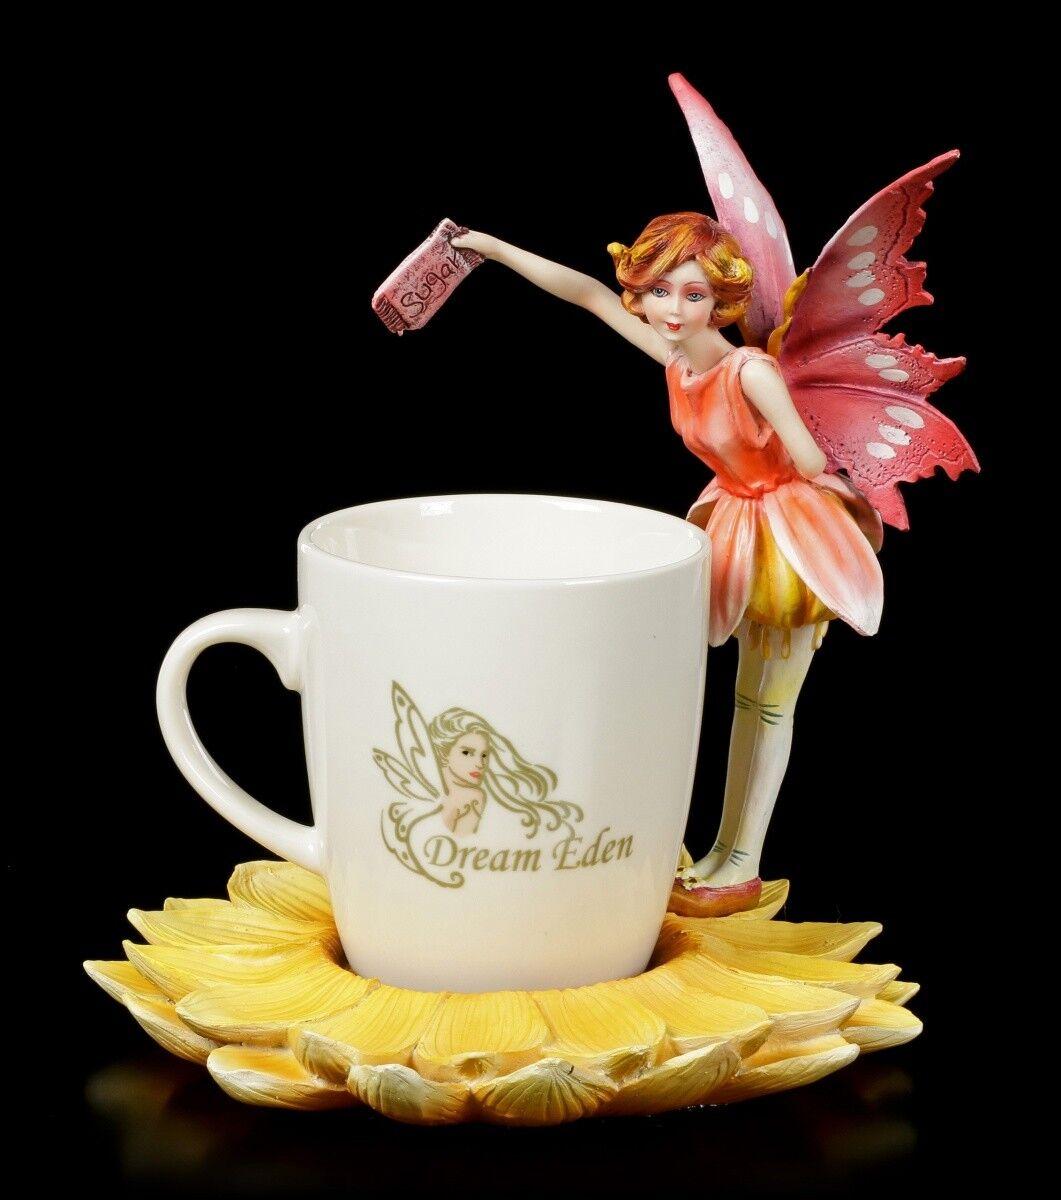 Elfen Figur mit Tasse - rouge Fairy Rara - Fee Tassenelfe Kaffeebecher Deko